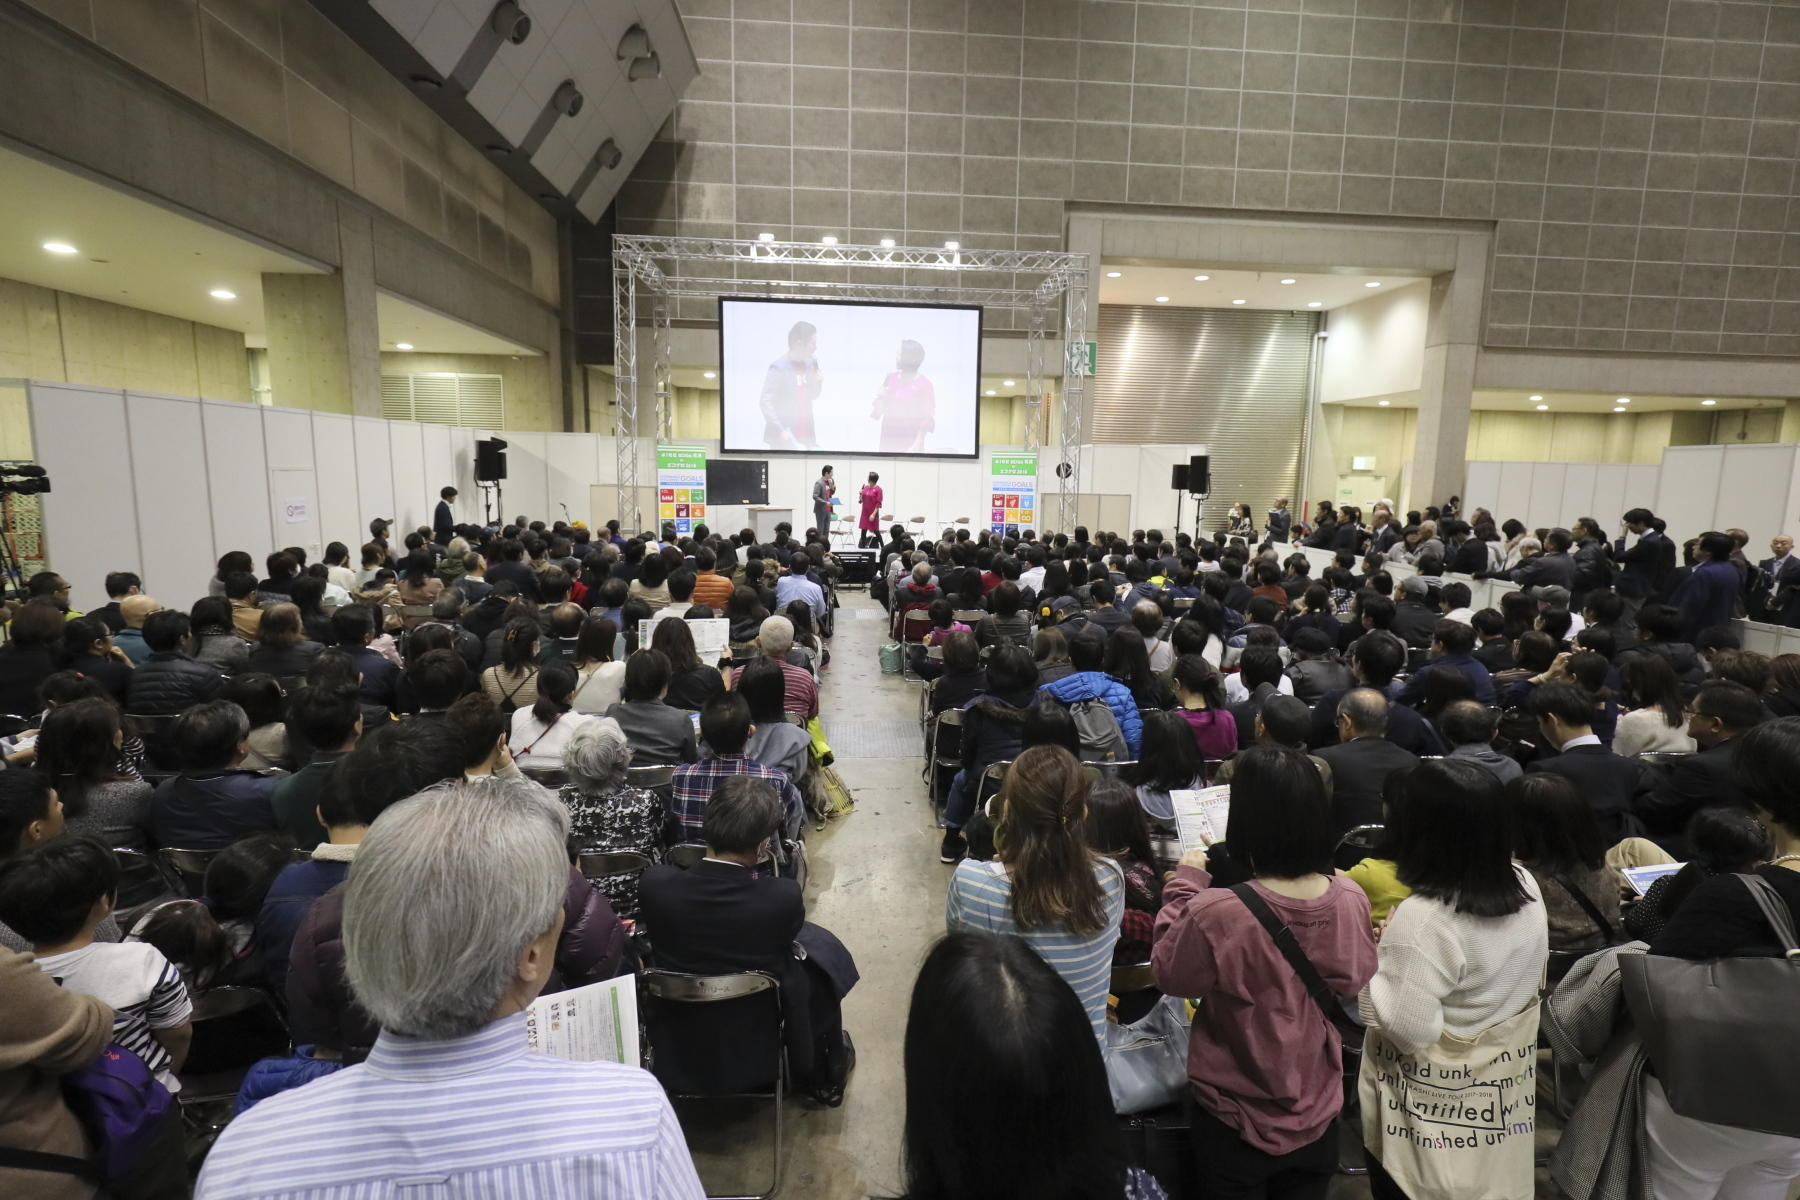 http://news.yoshimoto.co.jp/20181208232451-1063d383563adffb051569084eed9923bdc52426.jpg